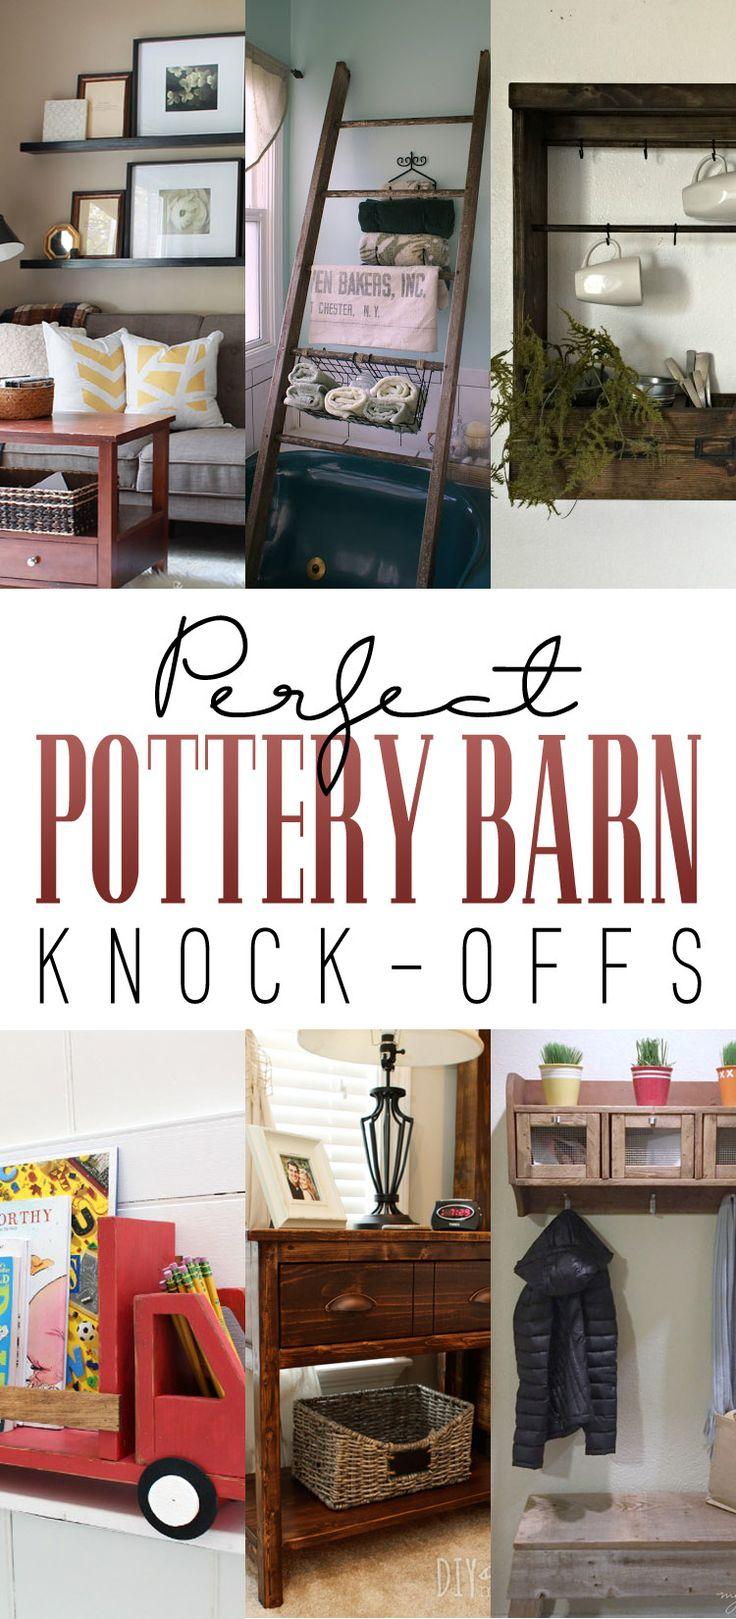 201 Best Pottery Barn Diy Images On Pinterest  Pottery Barn Inspired, Pottery  Barn Hacks And Home